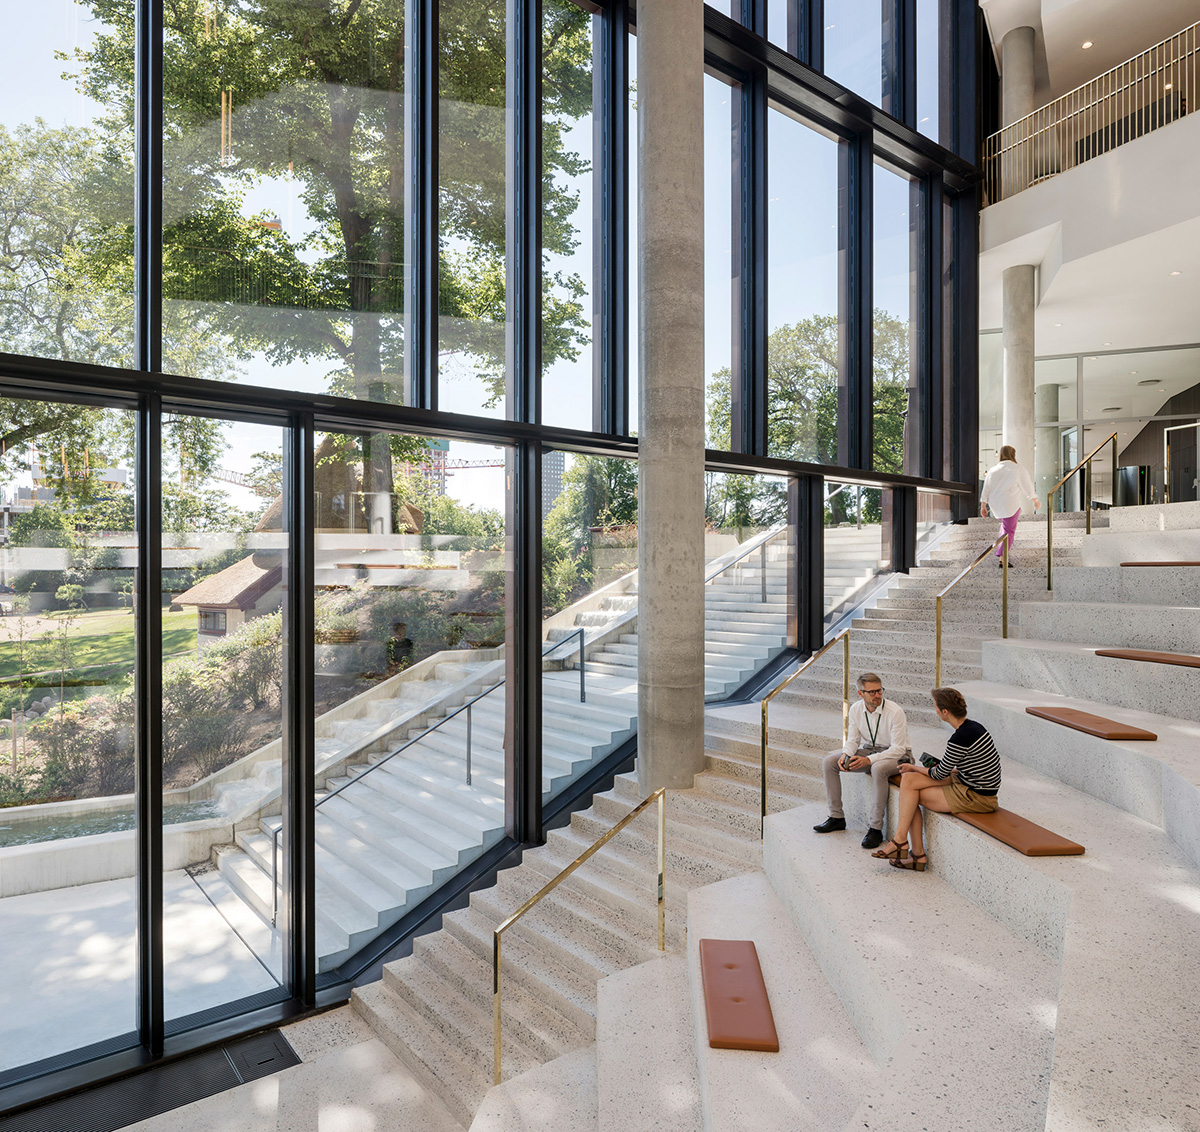 Carlsberg-Group-HQ-CF-Moller-Architects-Adam-Mork-05